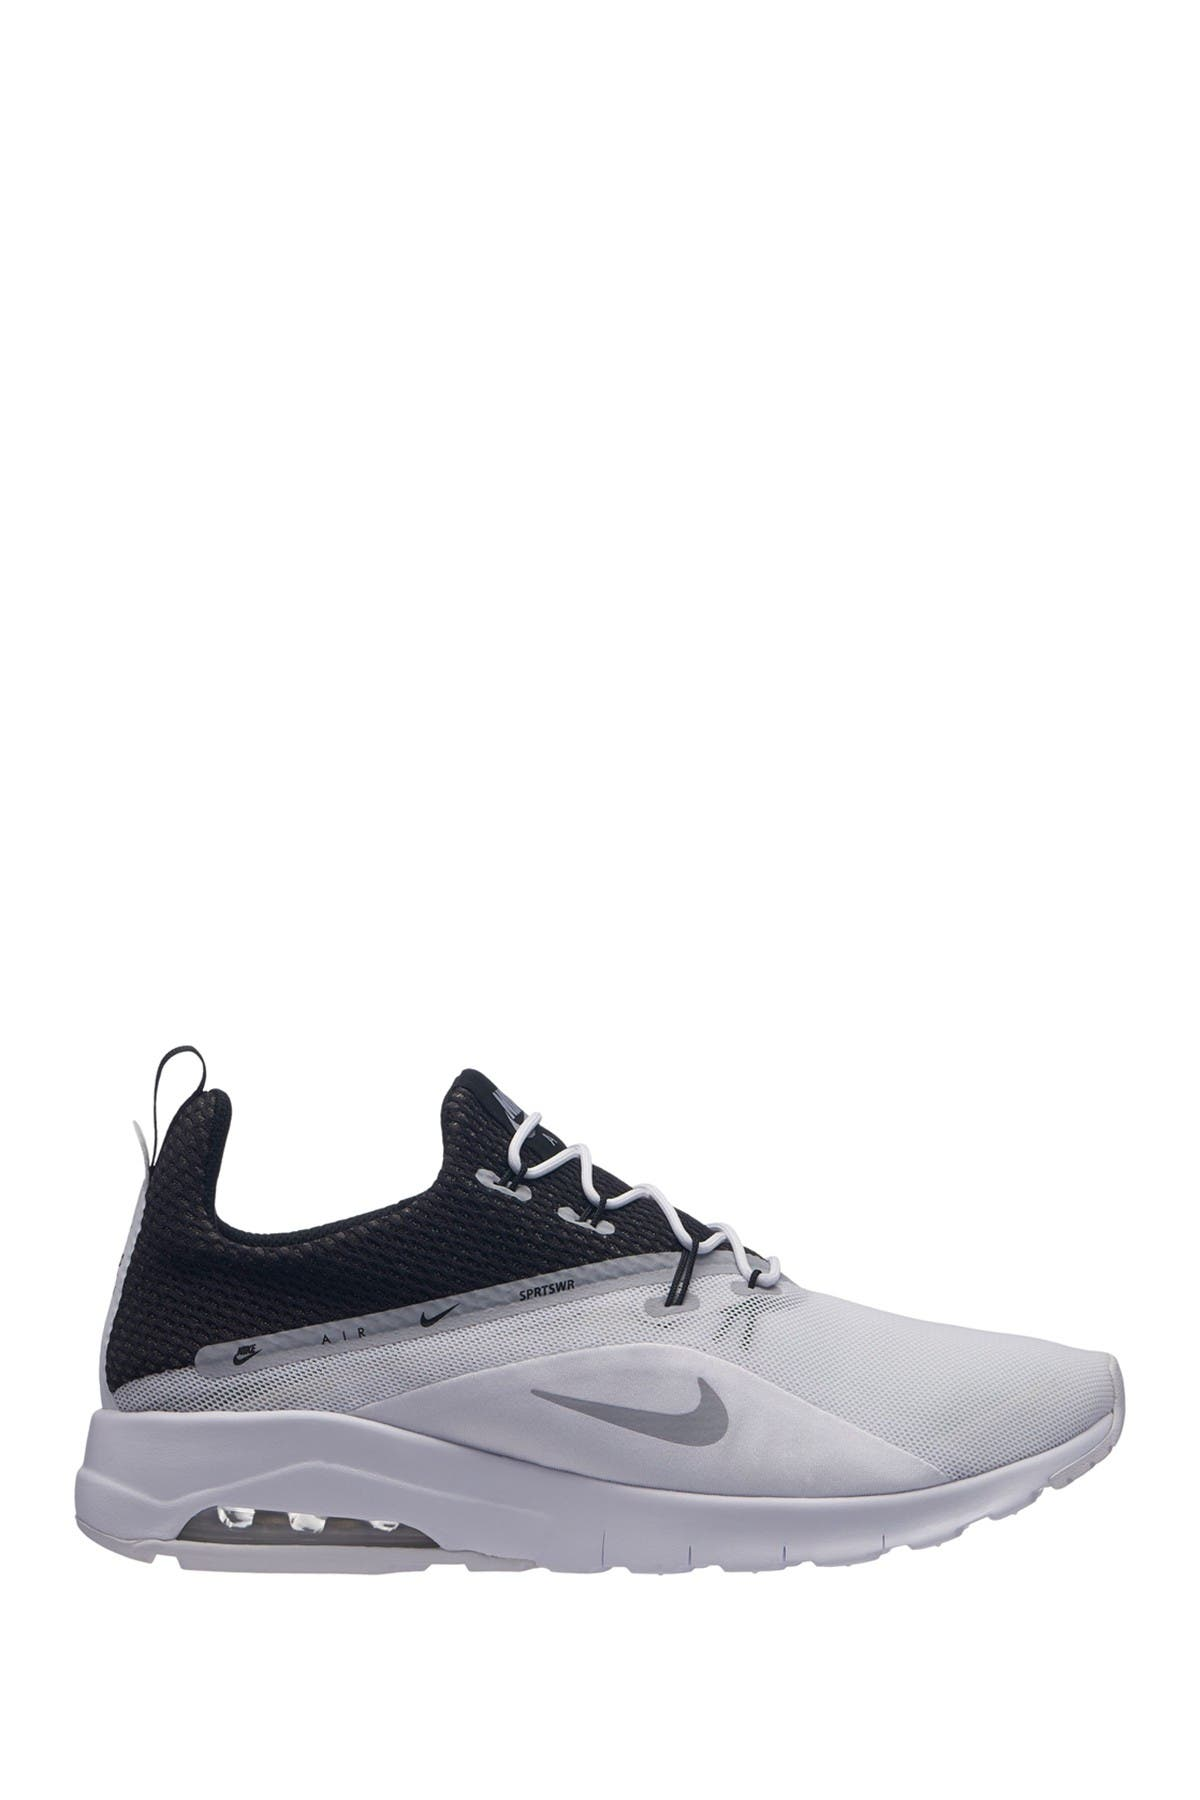 Nike | Air Max Motion Racer 2 Sneaker